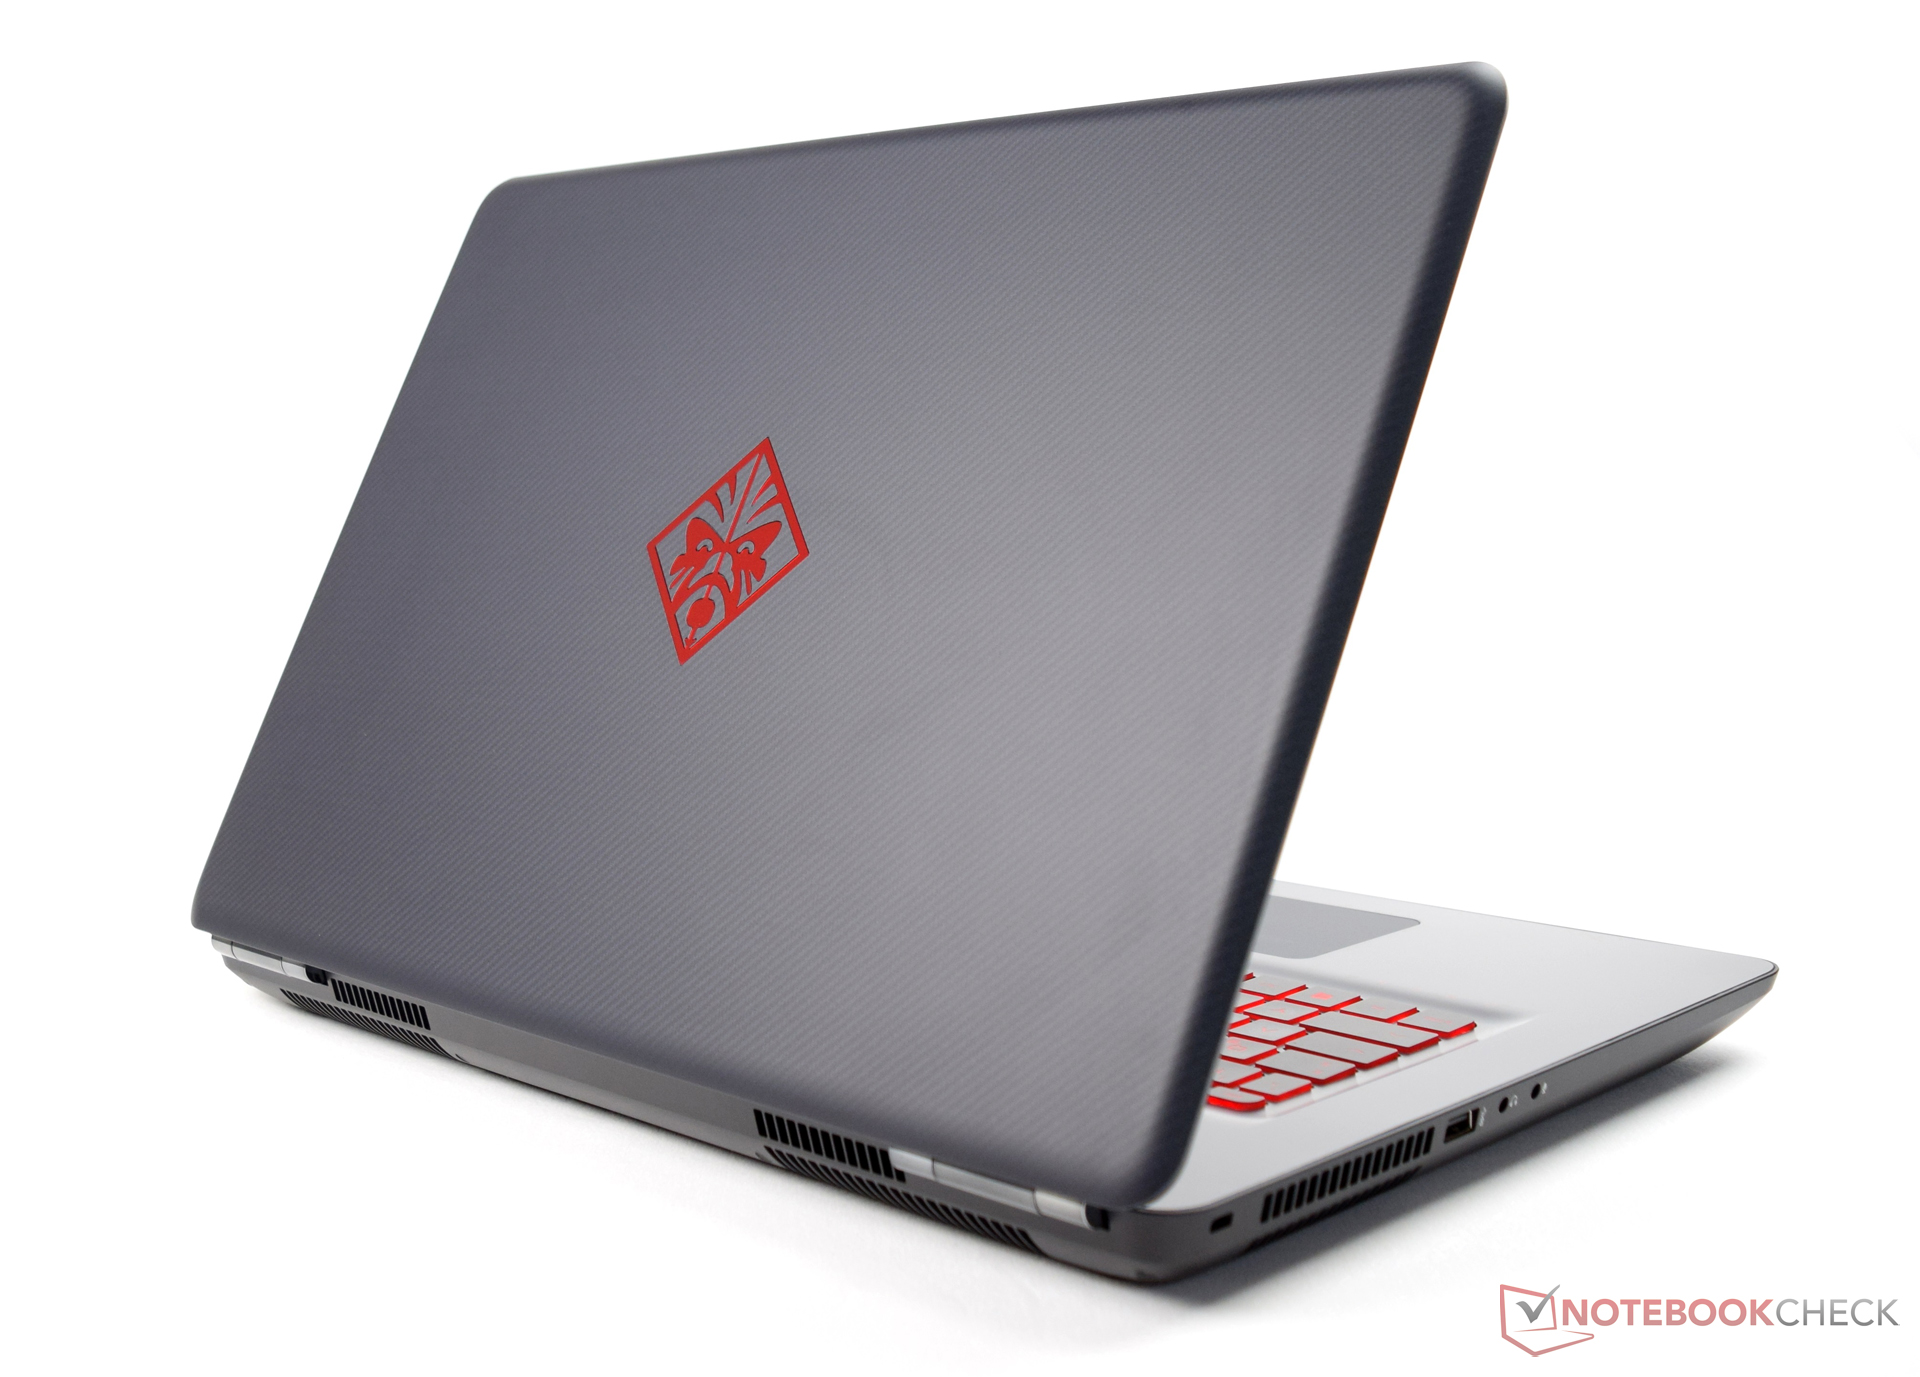 HP Omen 17 (i7-6700HQ, GTX 1070) Notebook Review ...